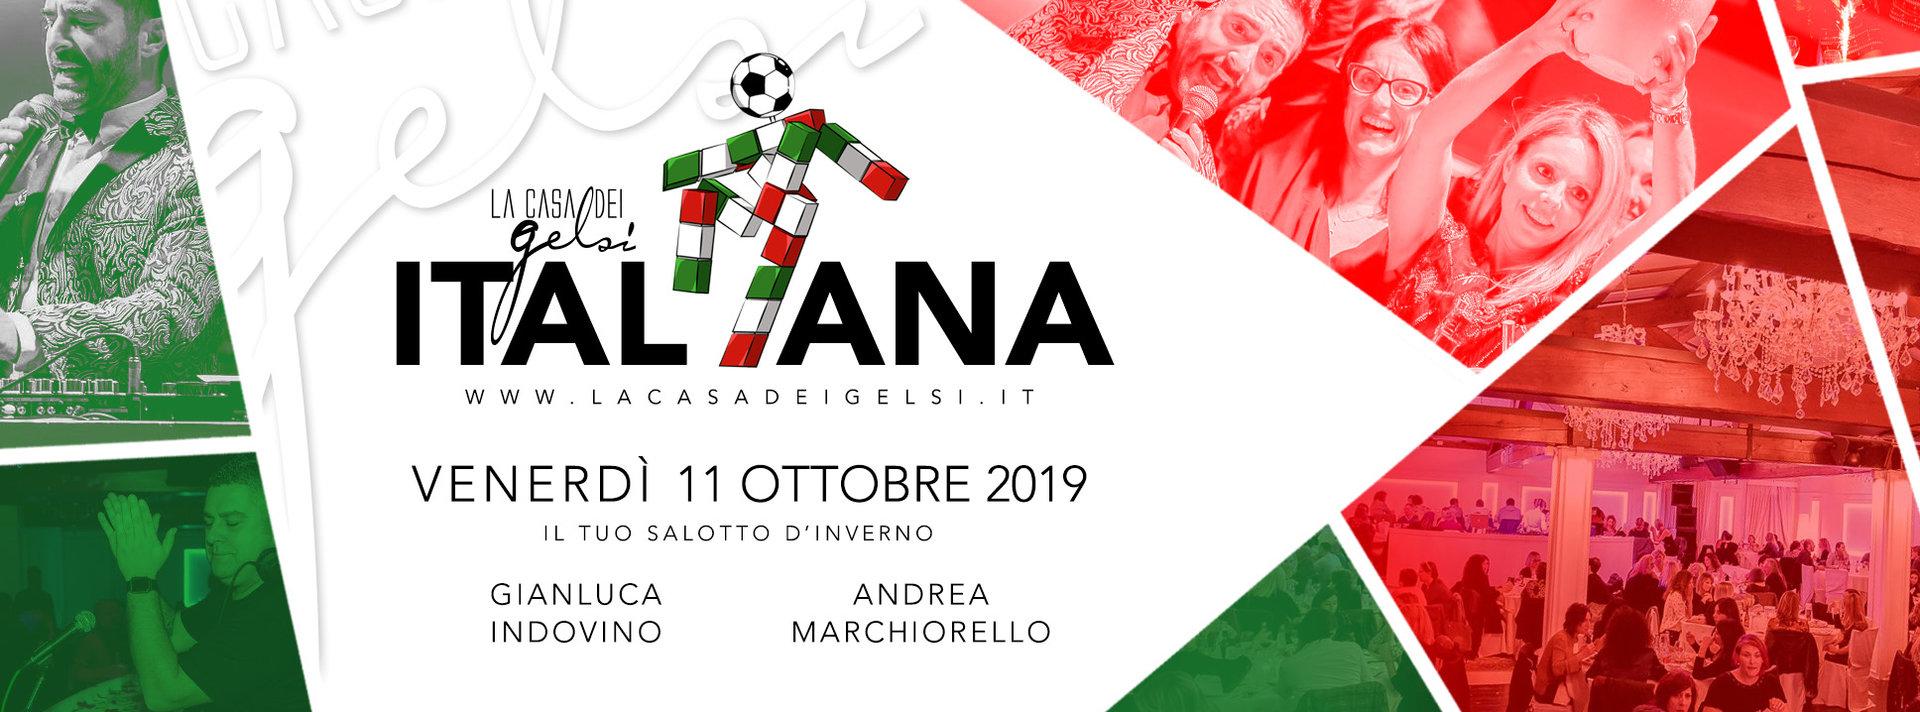 Serata Italiana - 11 ottobre 2019